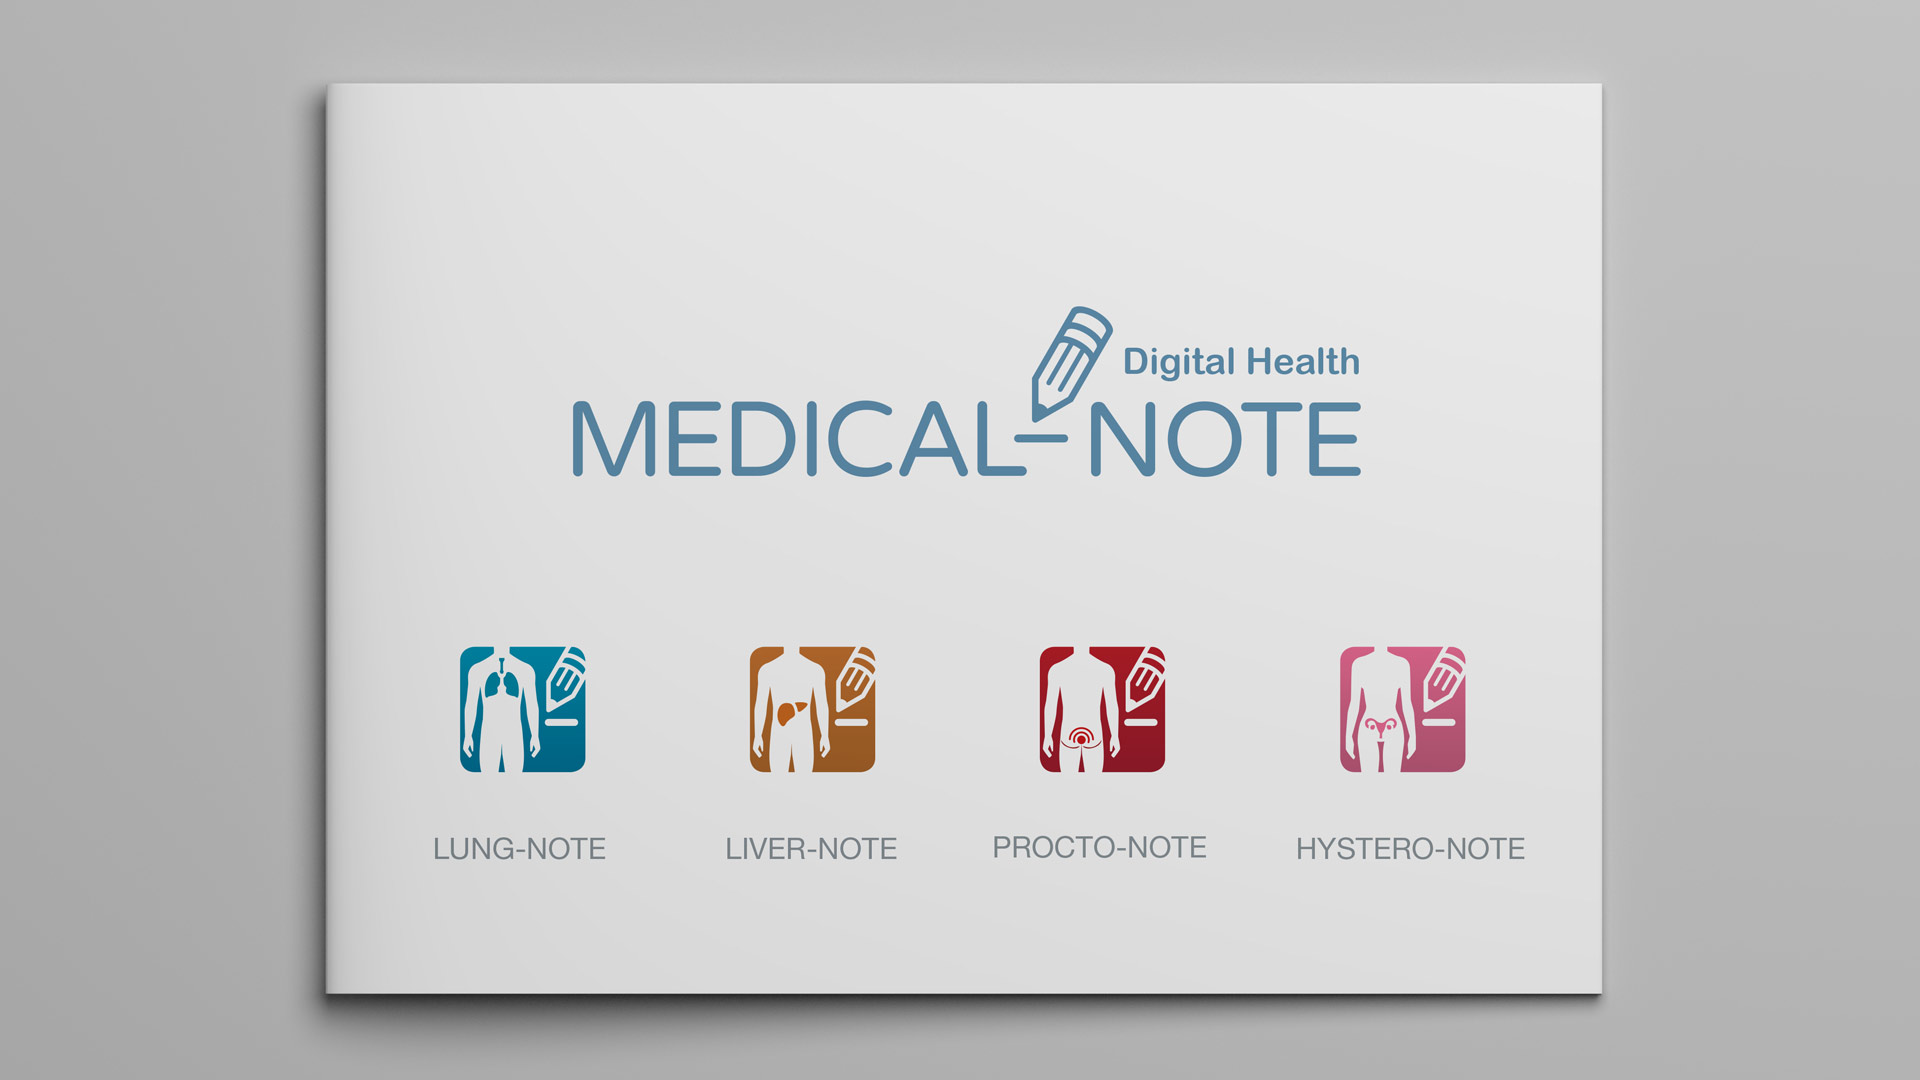 Medical Note